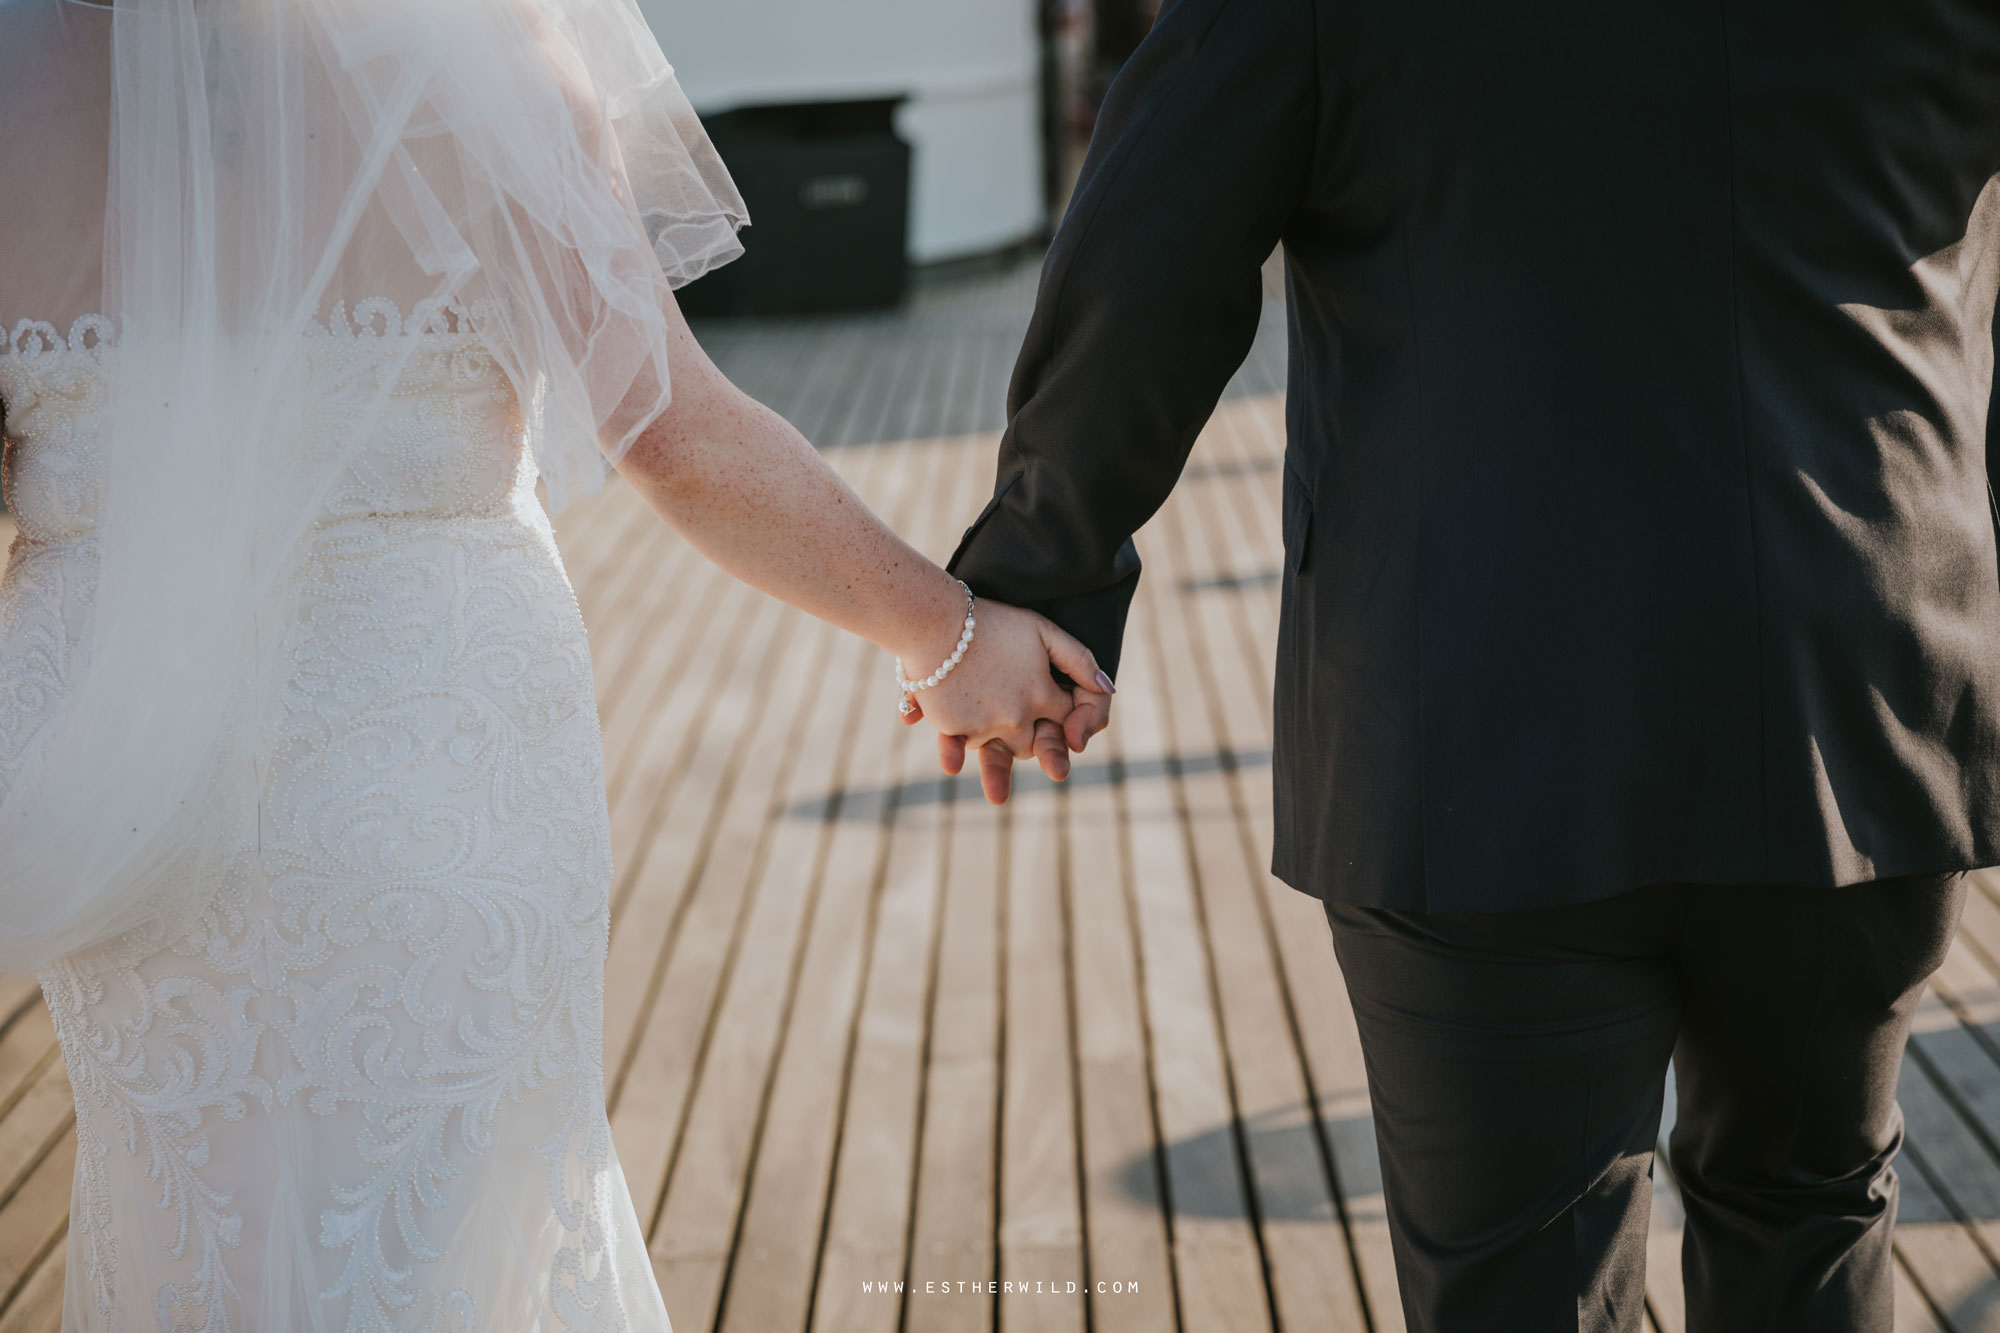 Cromer_Wedding_Beach_Outdoor_Ceremony_Norfolk_North_Lodge_Registry_Office_Rocket_House_Cafe_Cromer_Pier_IMG_4687.jpg